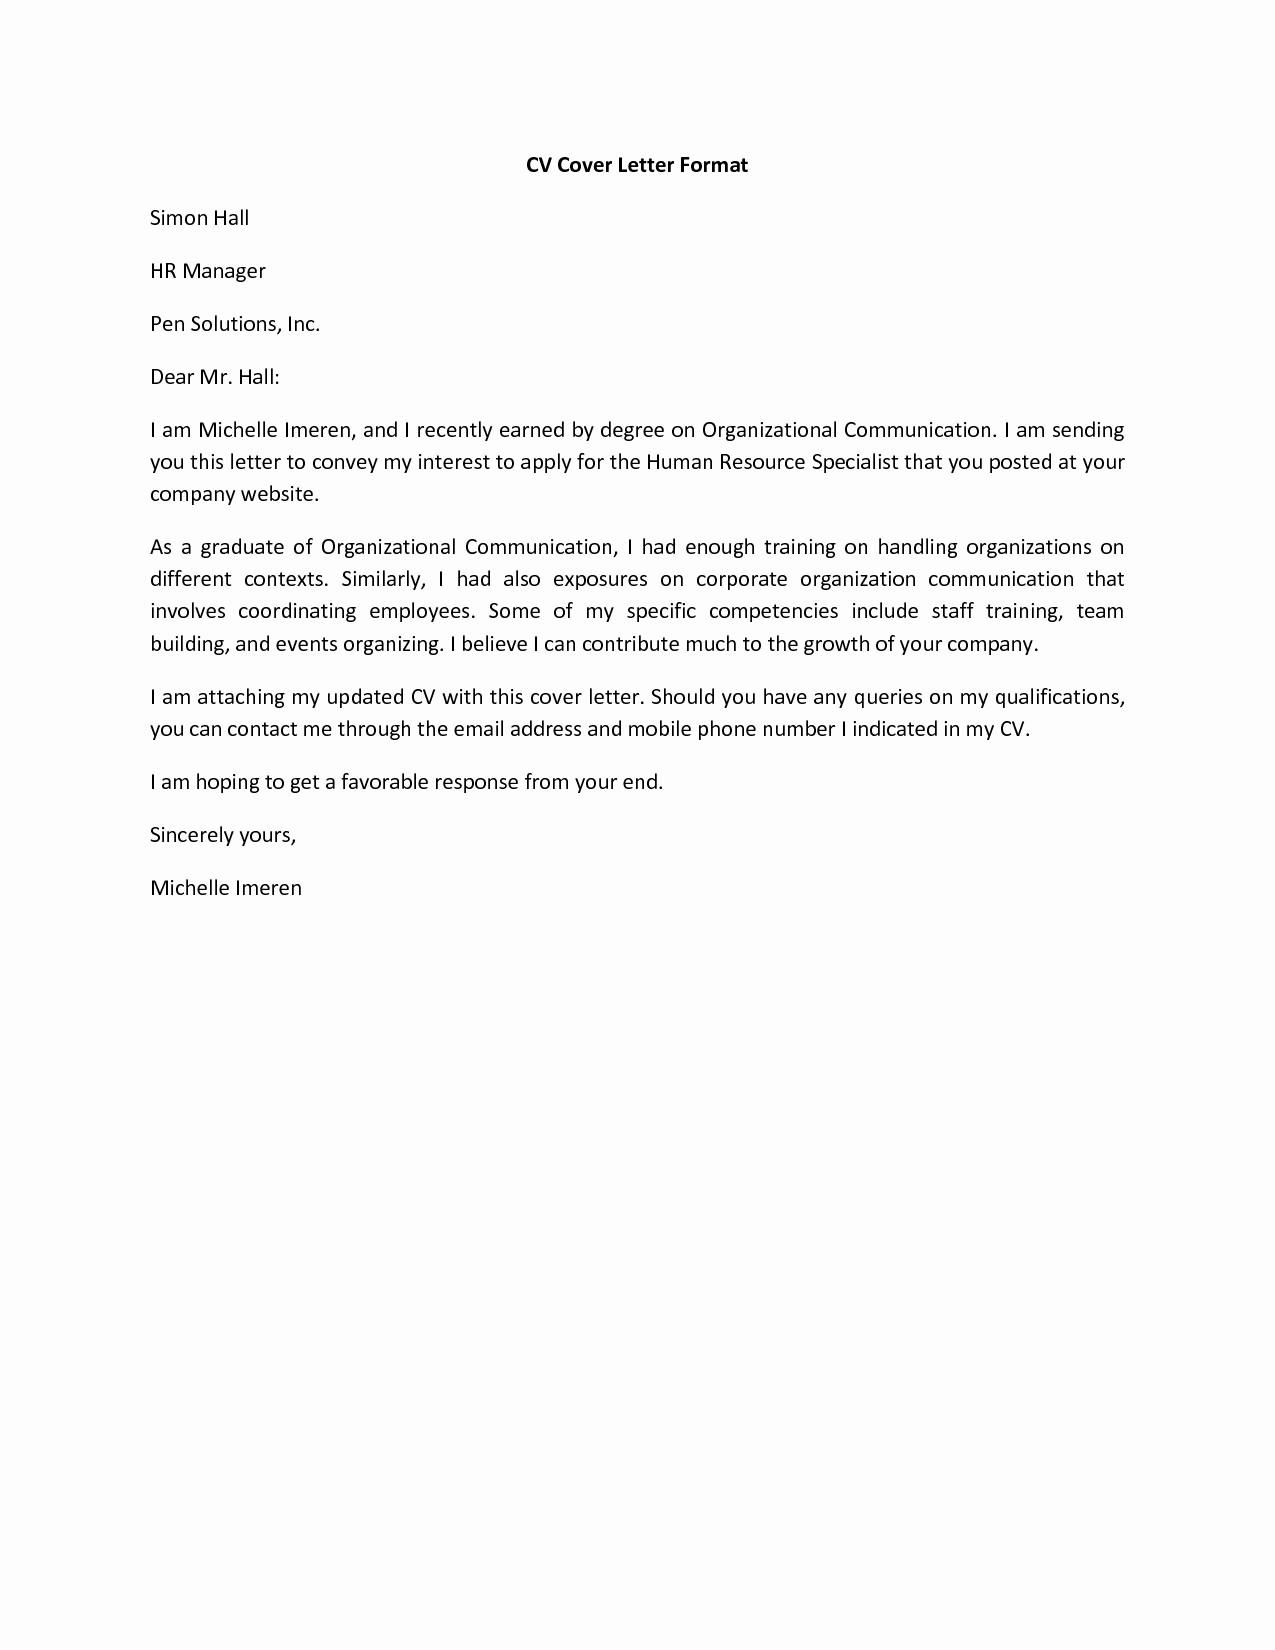 Cover Letter On A Resume Elegant Basic Cover Letter for A Resume